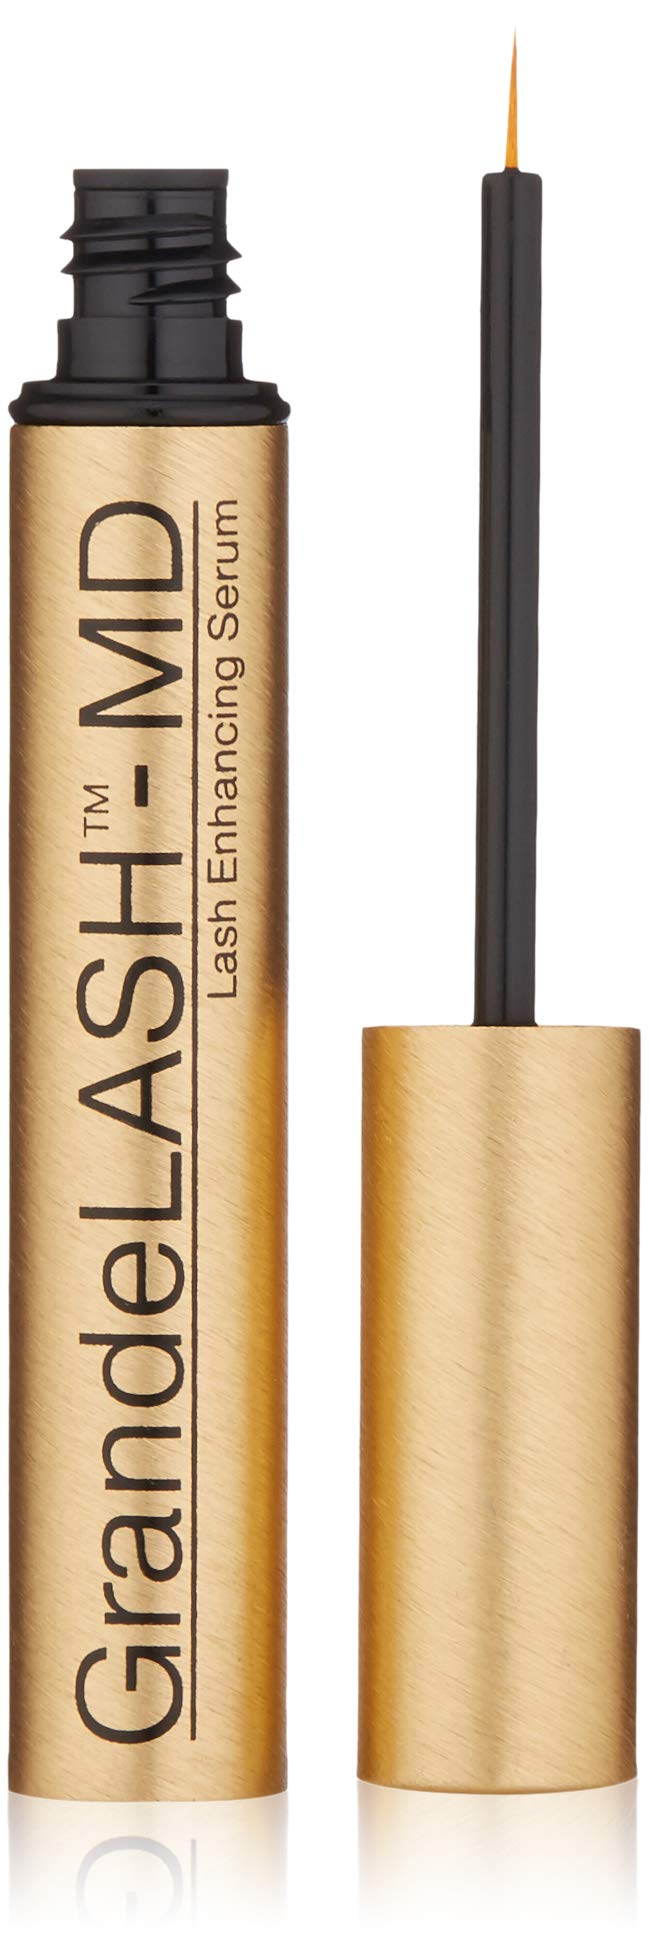 Grande Cosmetics GrandeLASHMD 6 Month Supply, 4ml by Grande Cosmetics (Image #1)